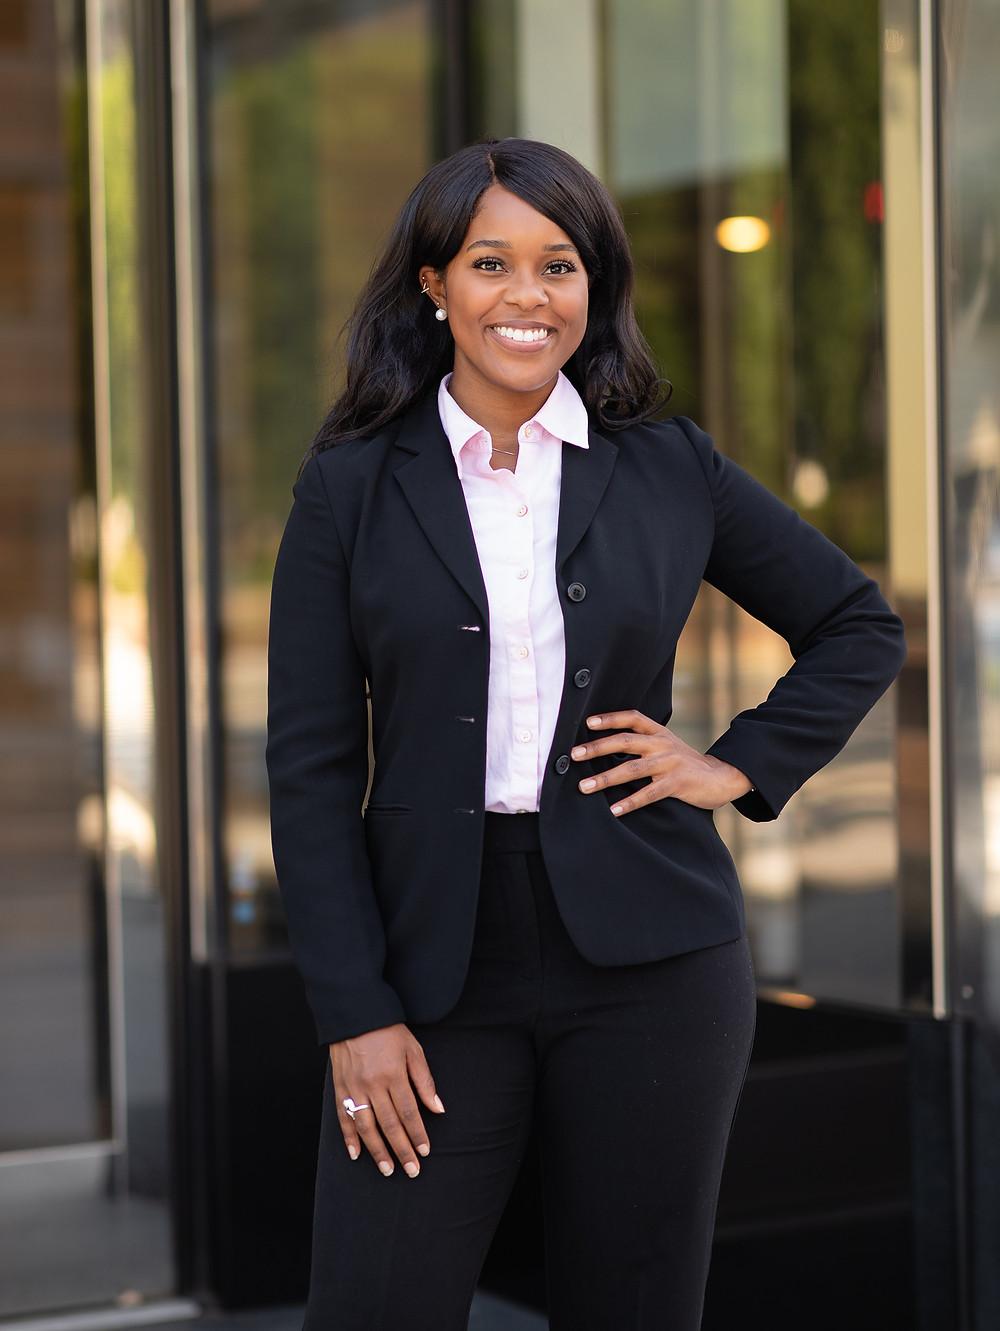 Beautiful professional woman headshot in Washington, DC